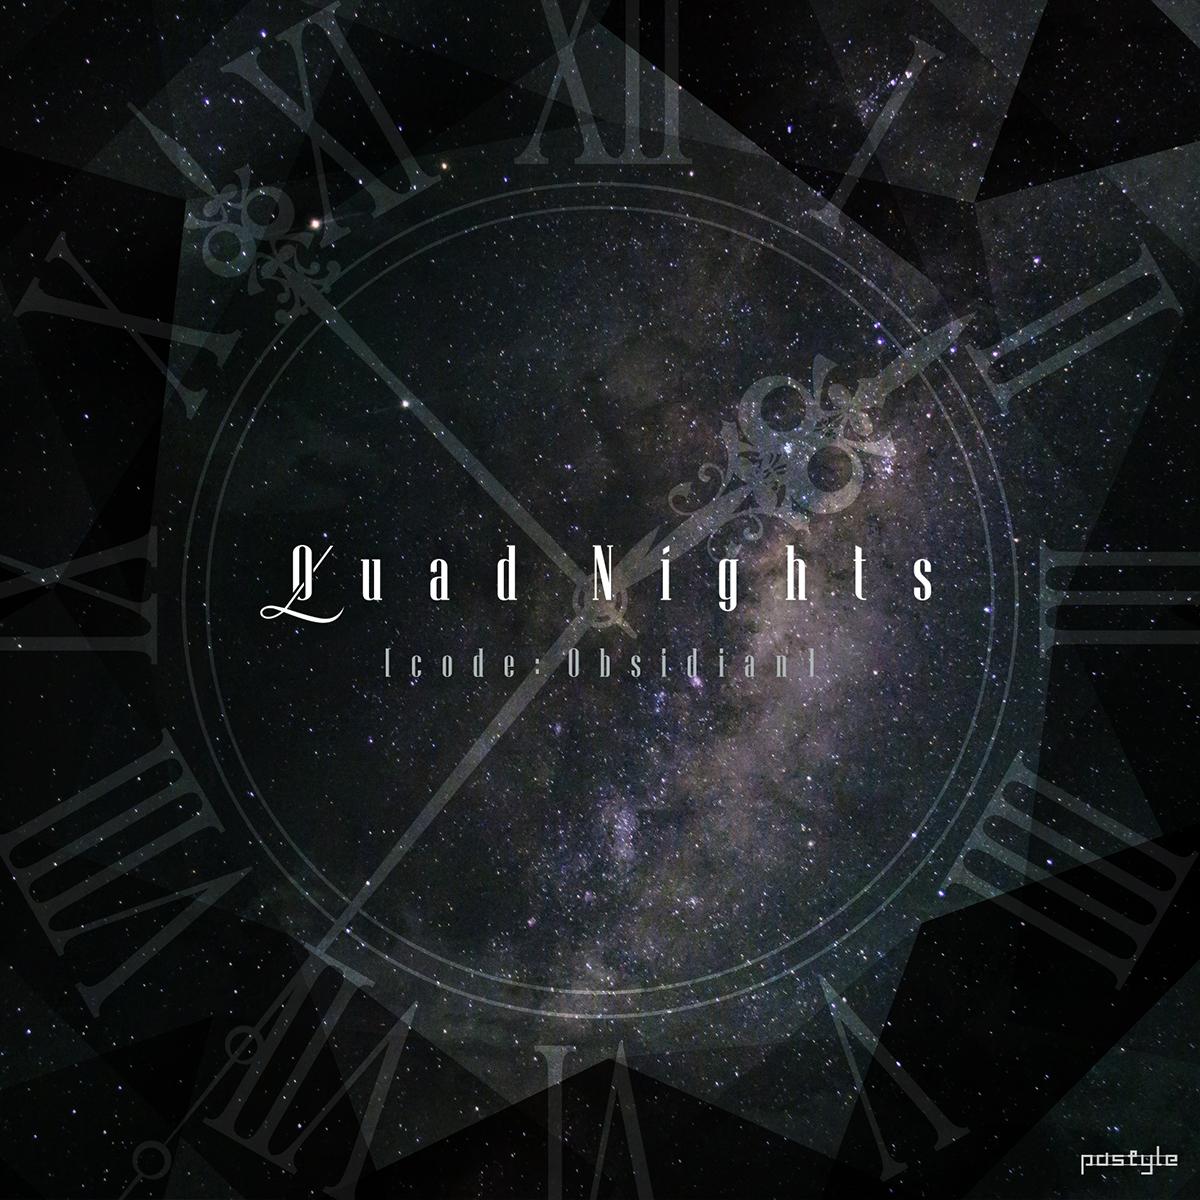 Quad Nights [code:Obsidian]